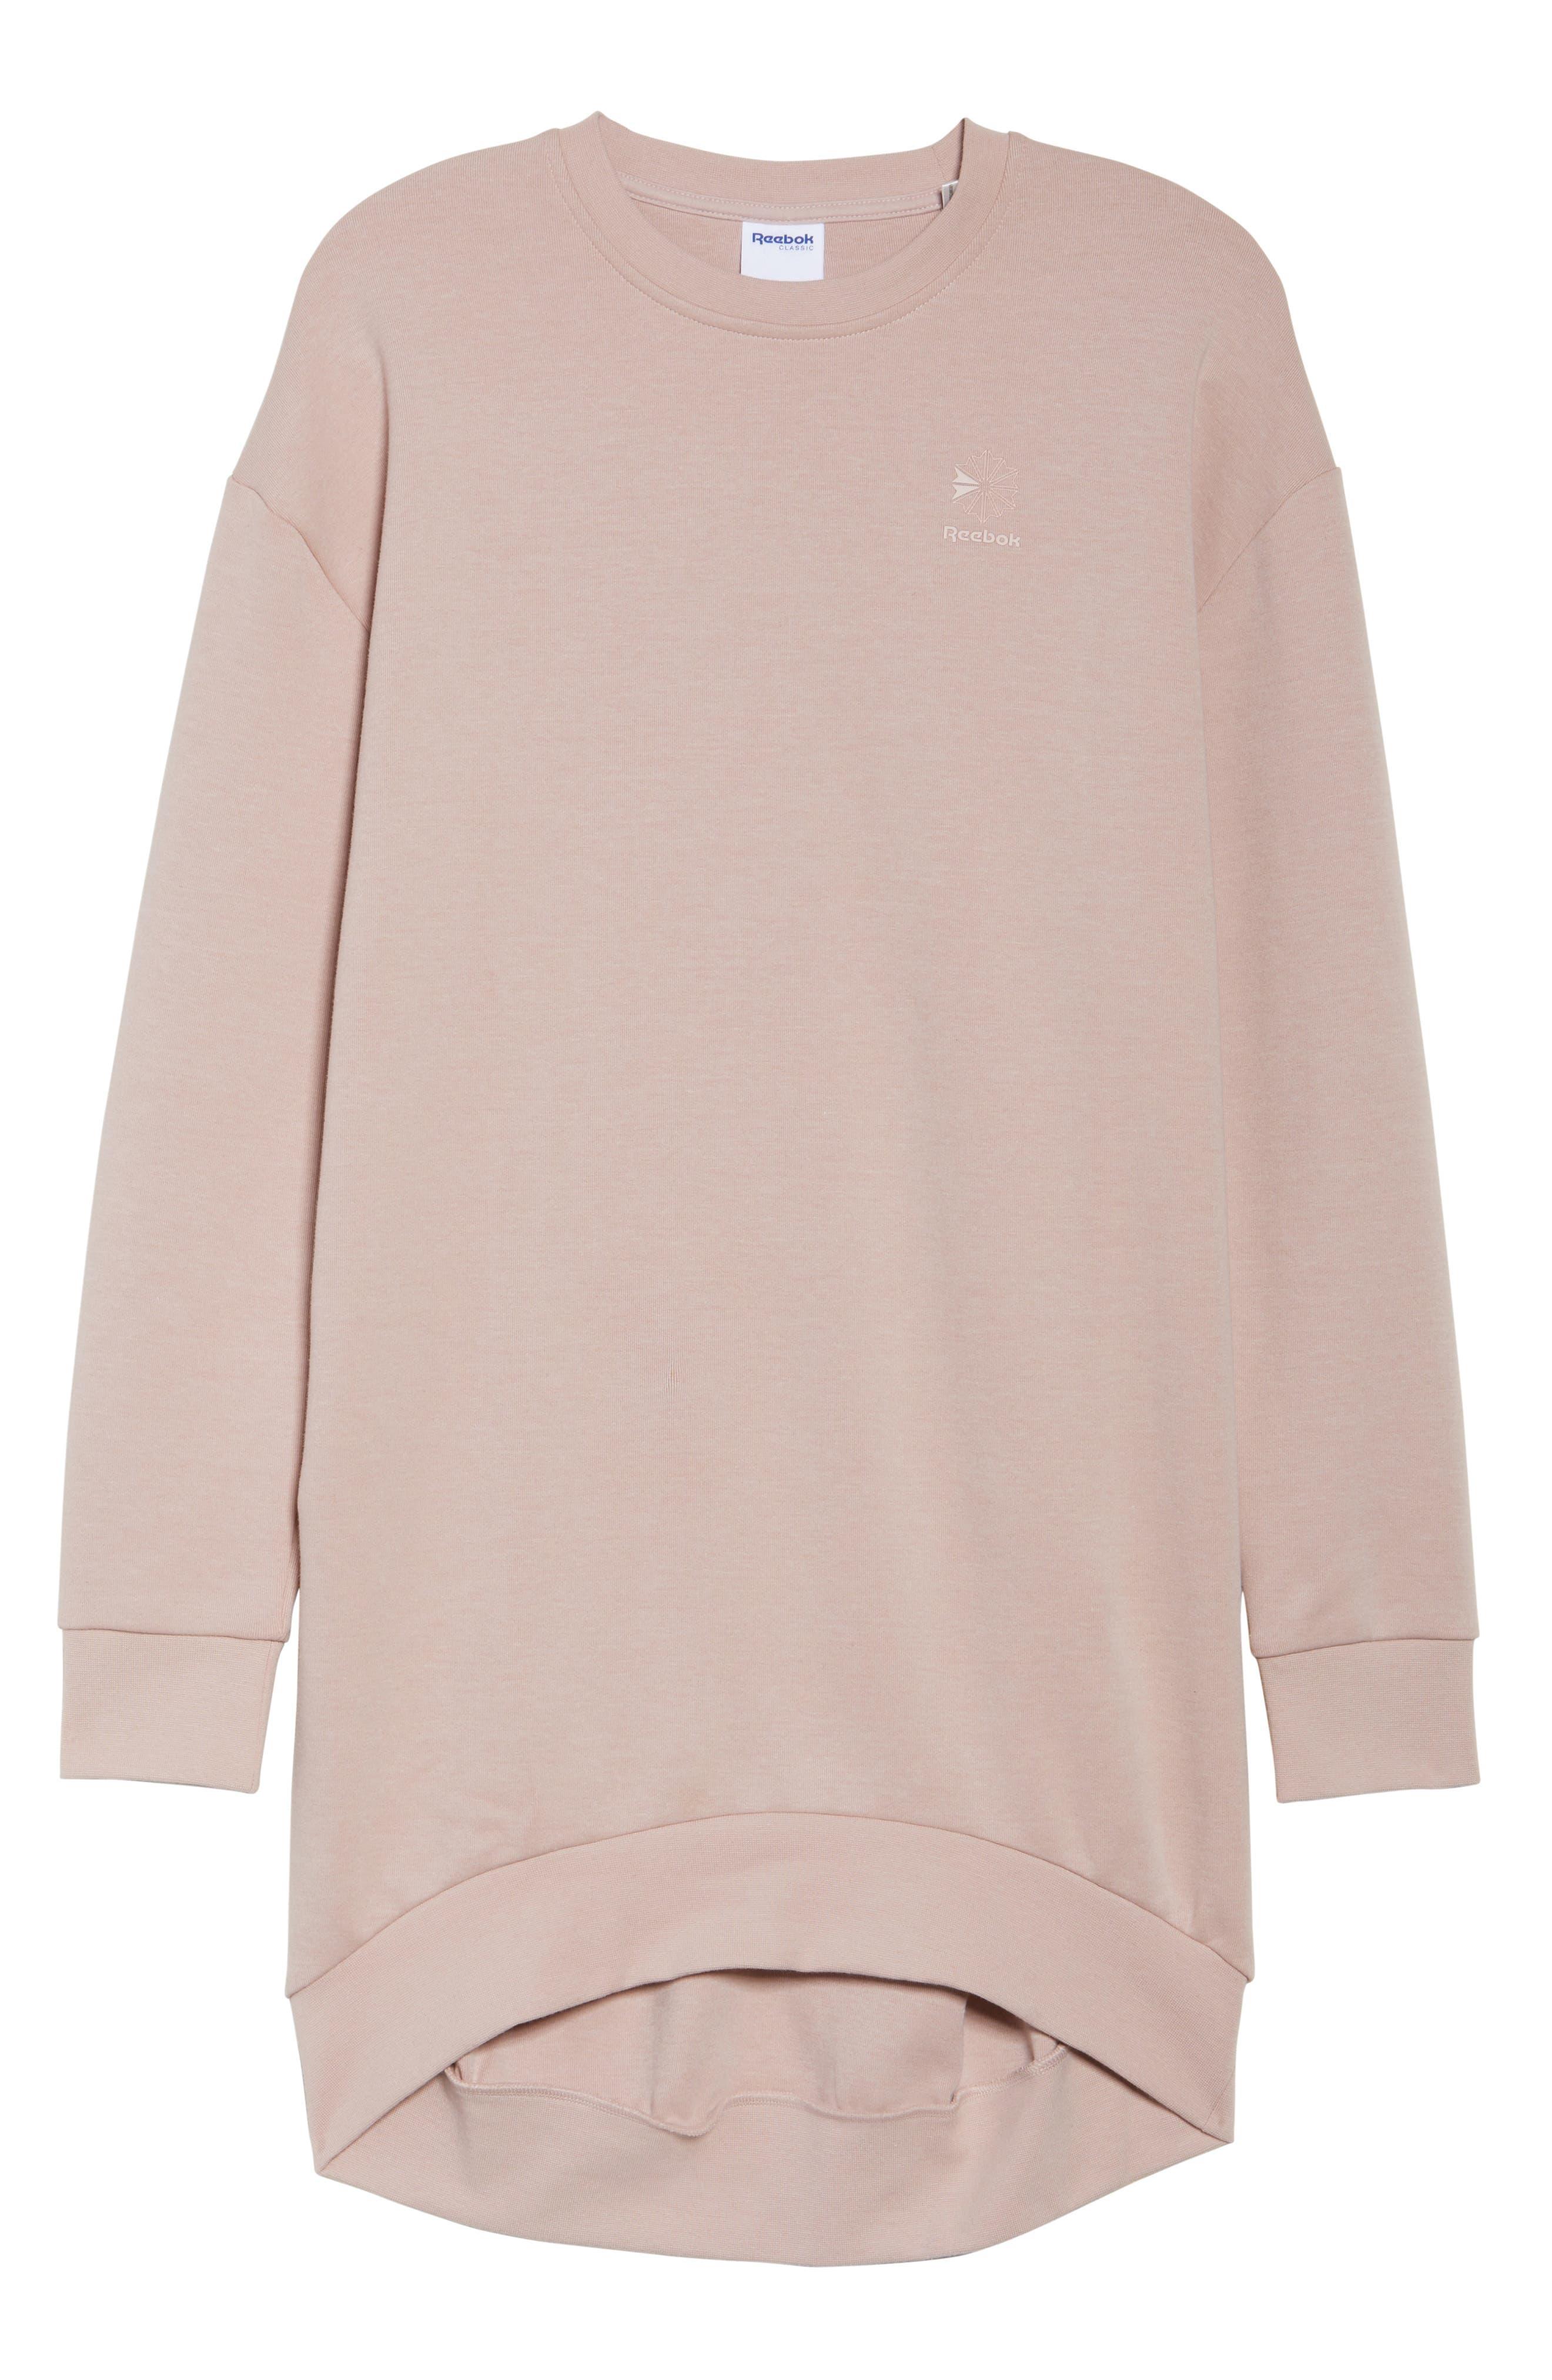 Main Image - Reebok Oversized Sweatshirt